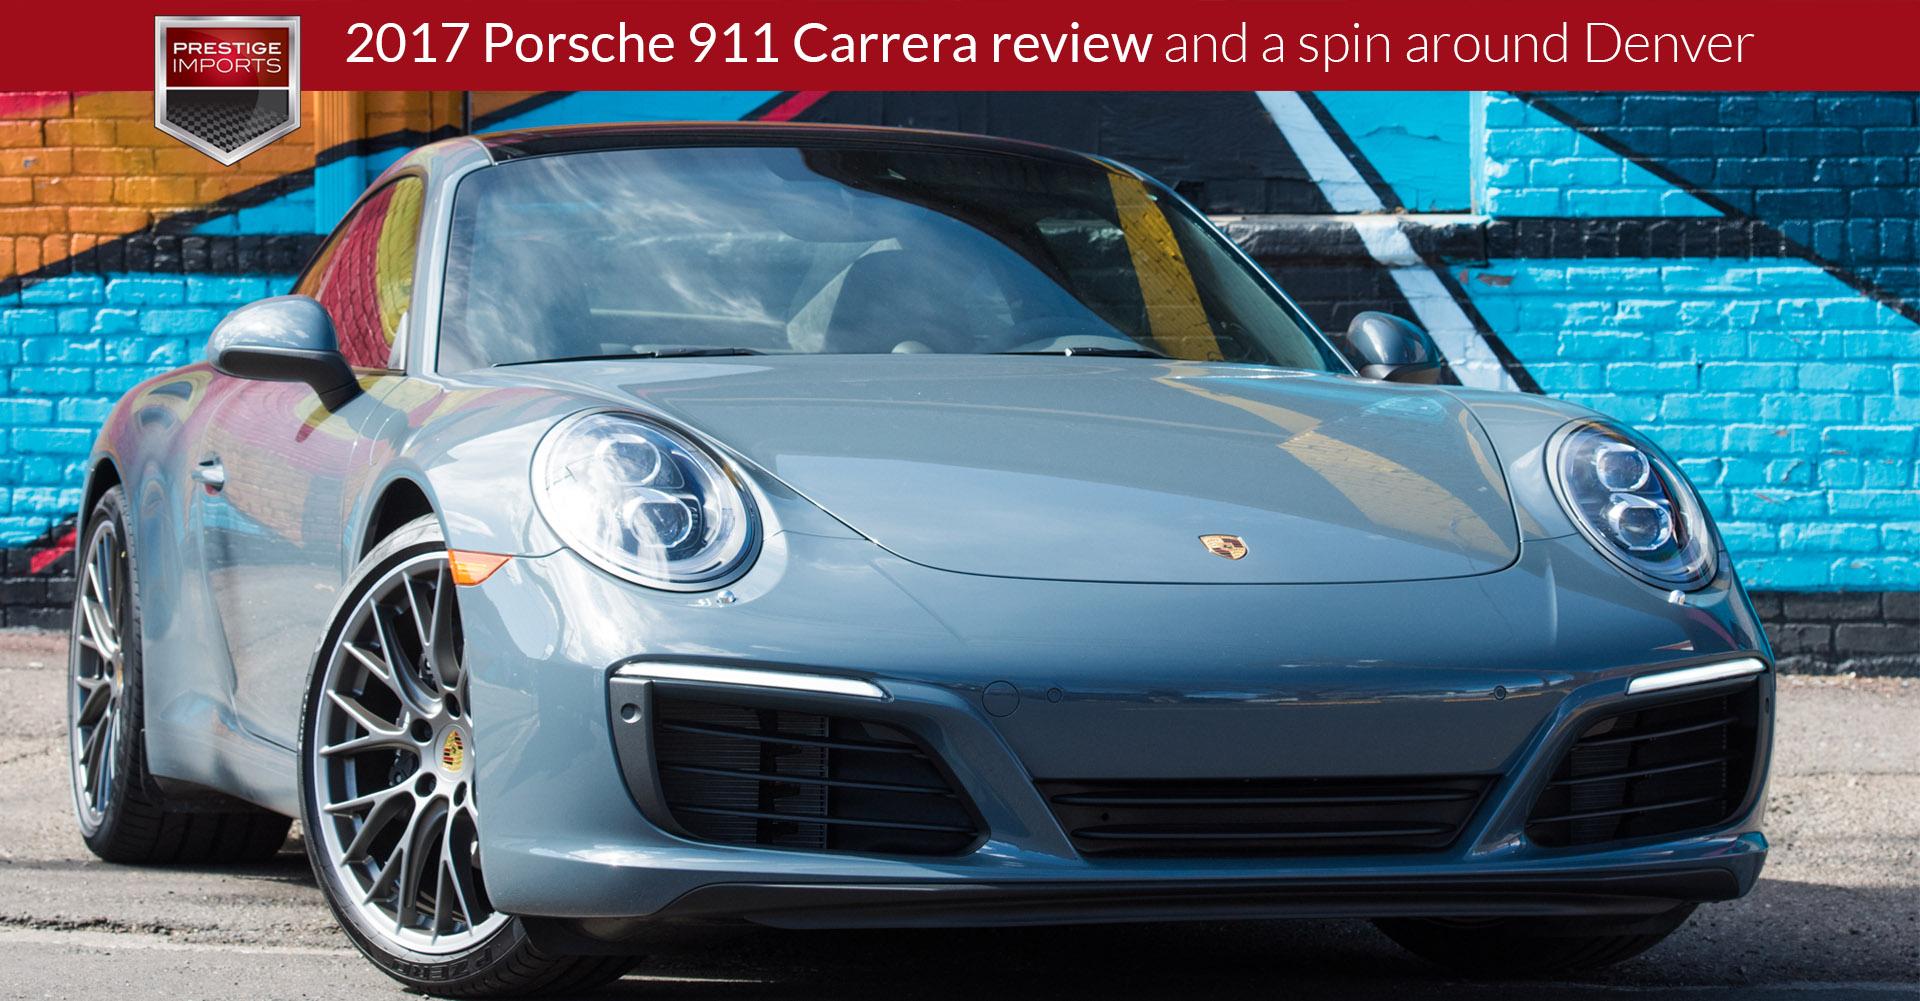 2017 porsche 911 carrera review and a spin around denver. Black Bedroom Furniture Sets. Home Design Ideas